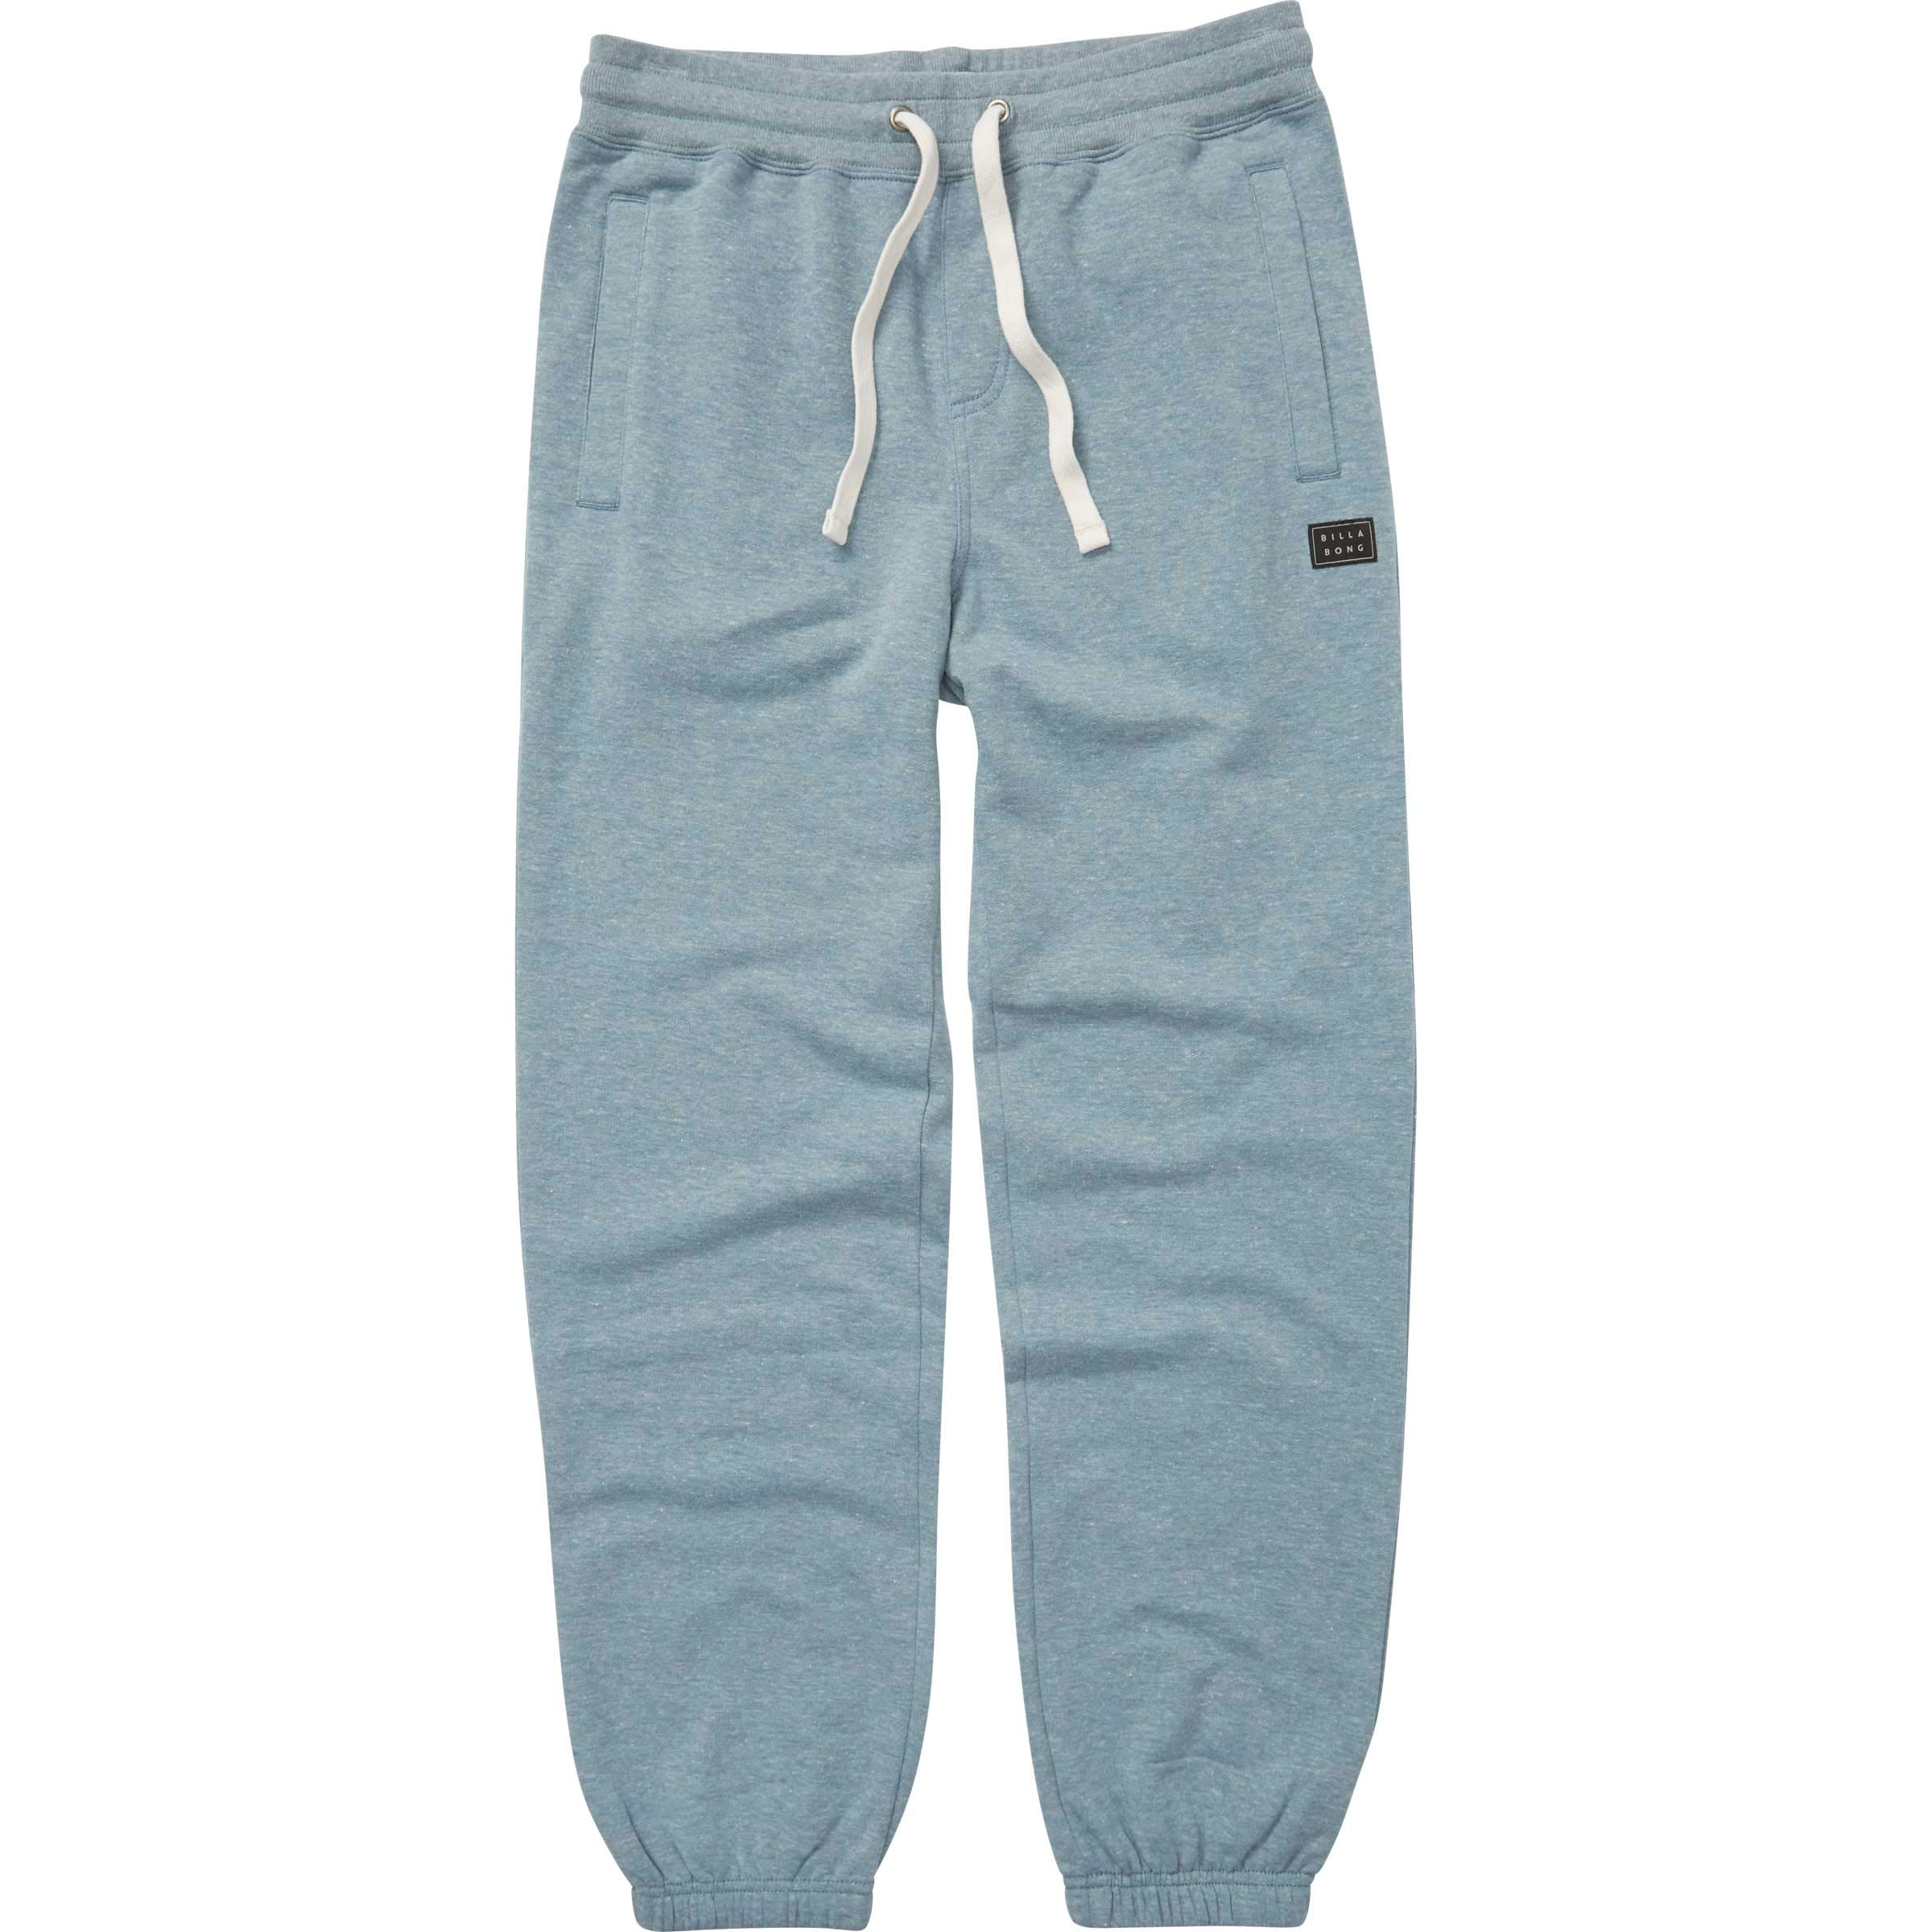 Billabong Boys' Big Day Pant Sweatpant, Washed Blue, M